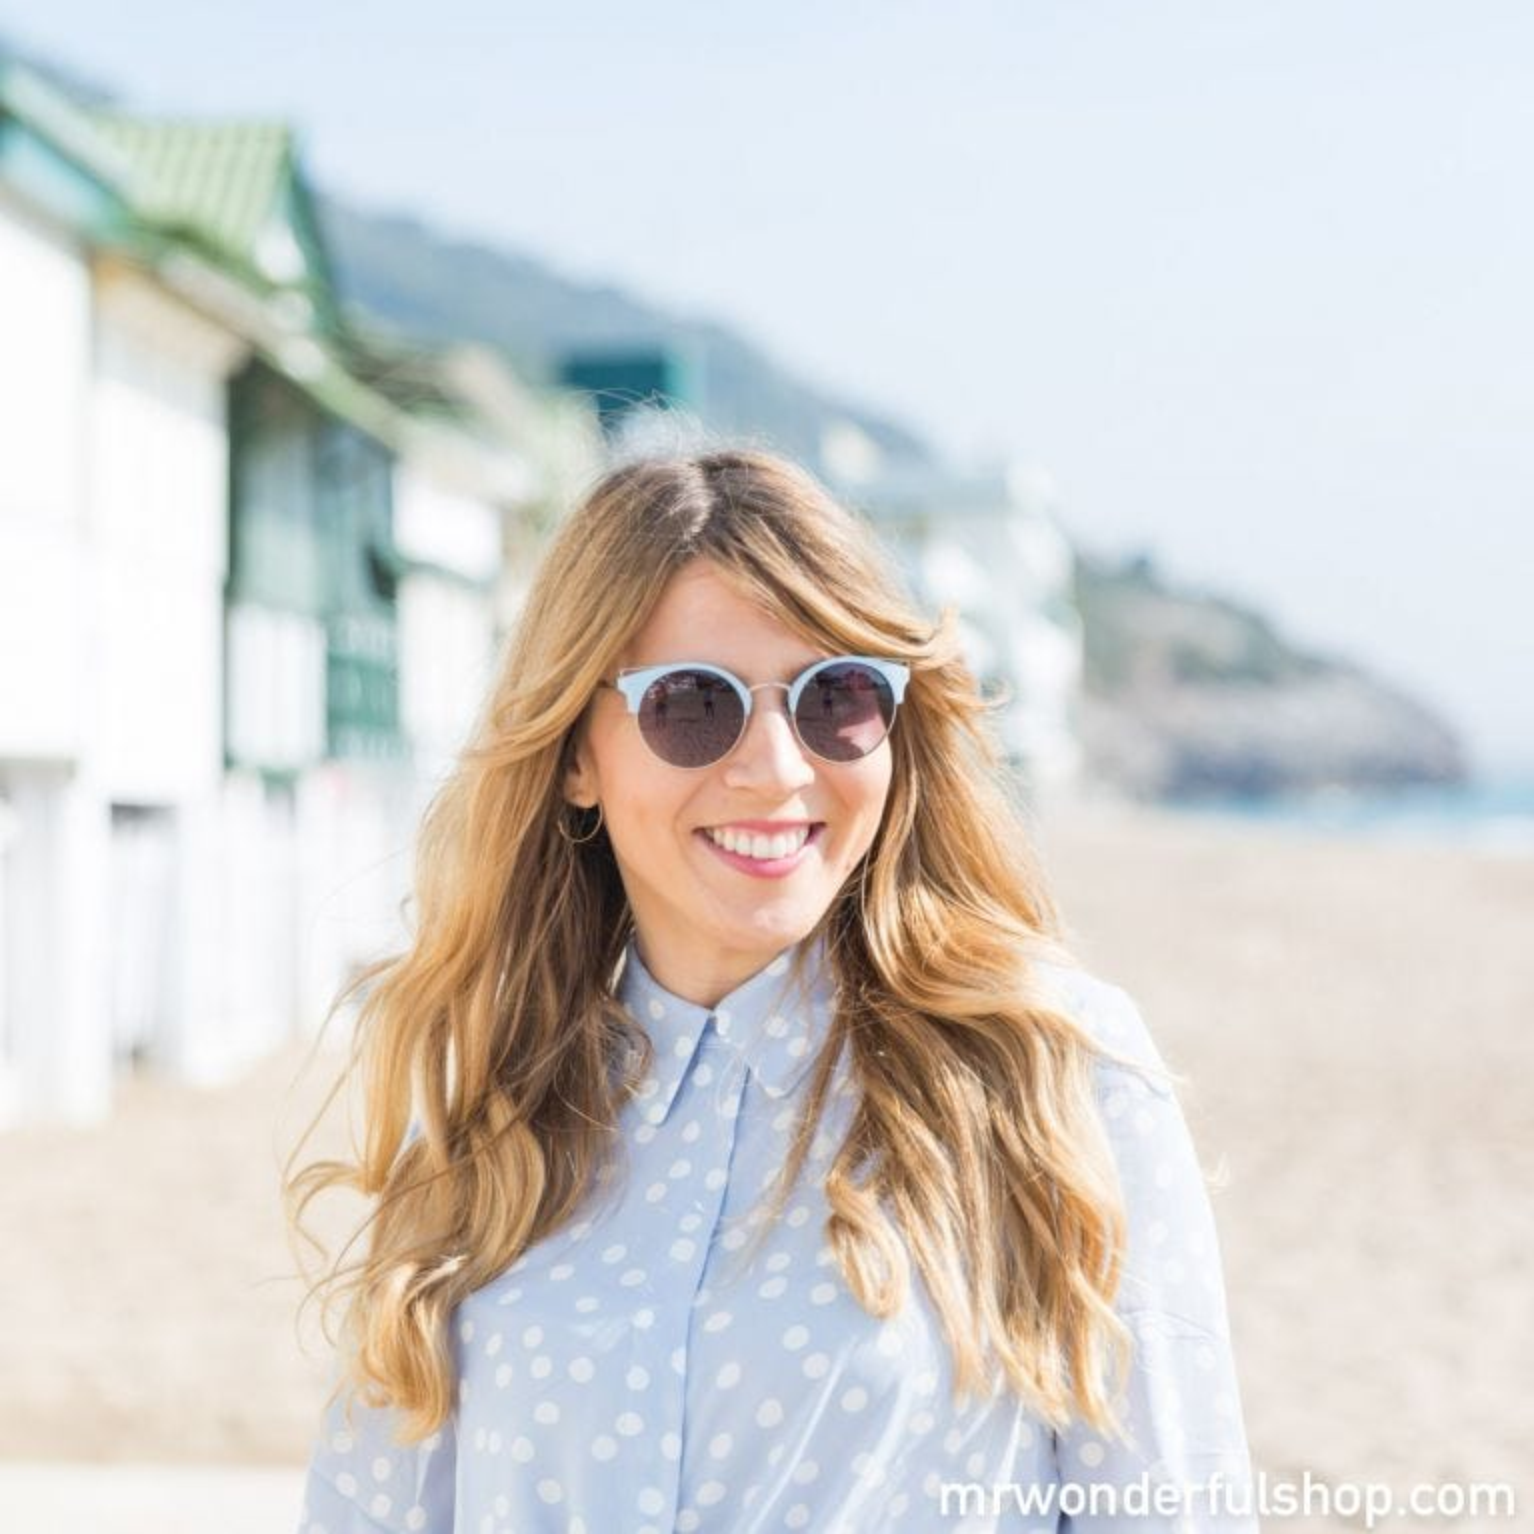 Sunglasses - Blue skyline